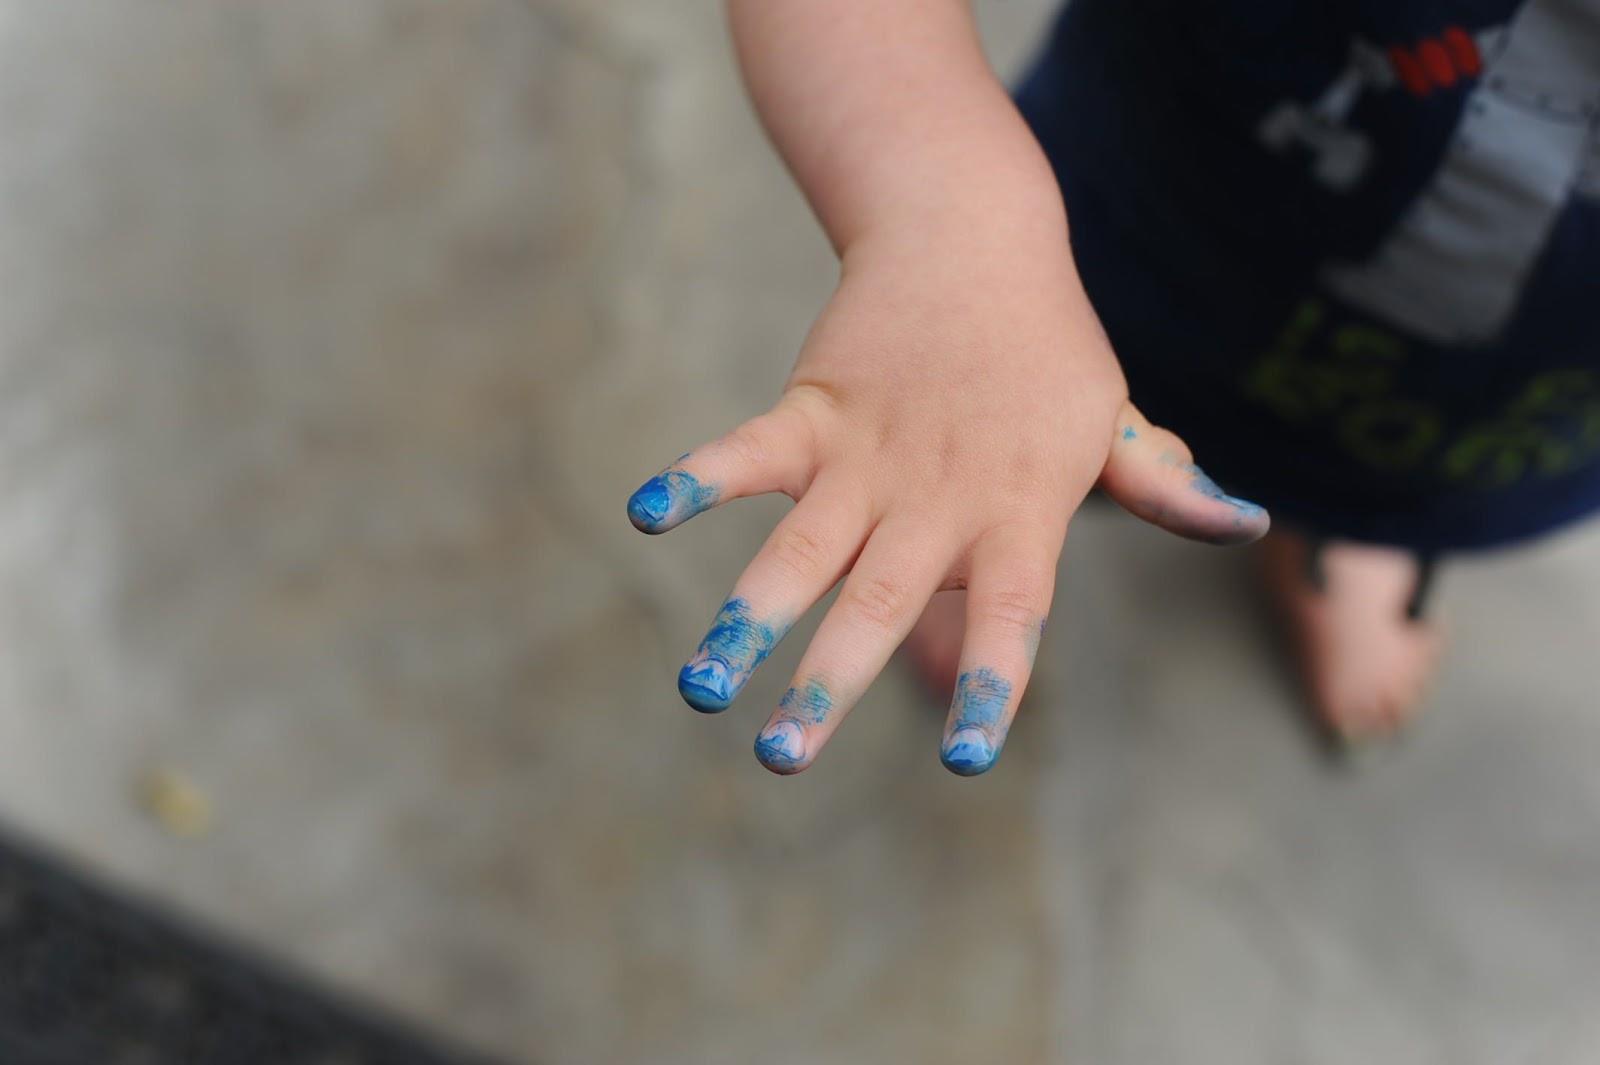 Painted Fingernails Images - Reverse Search